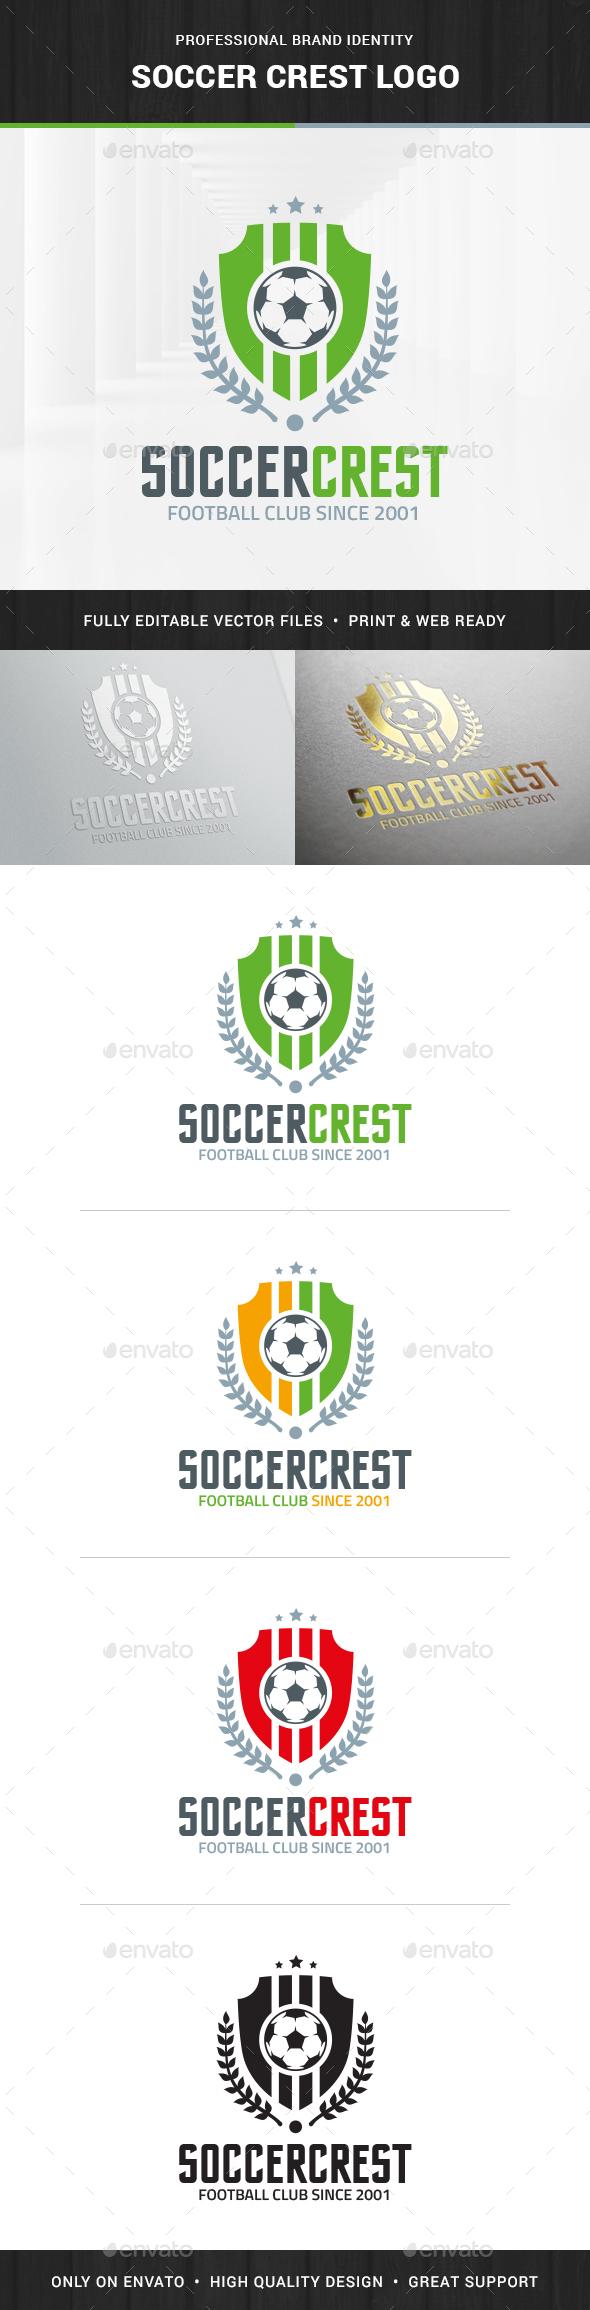 Soccer Crest Logo Template - Logo Templates